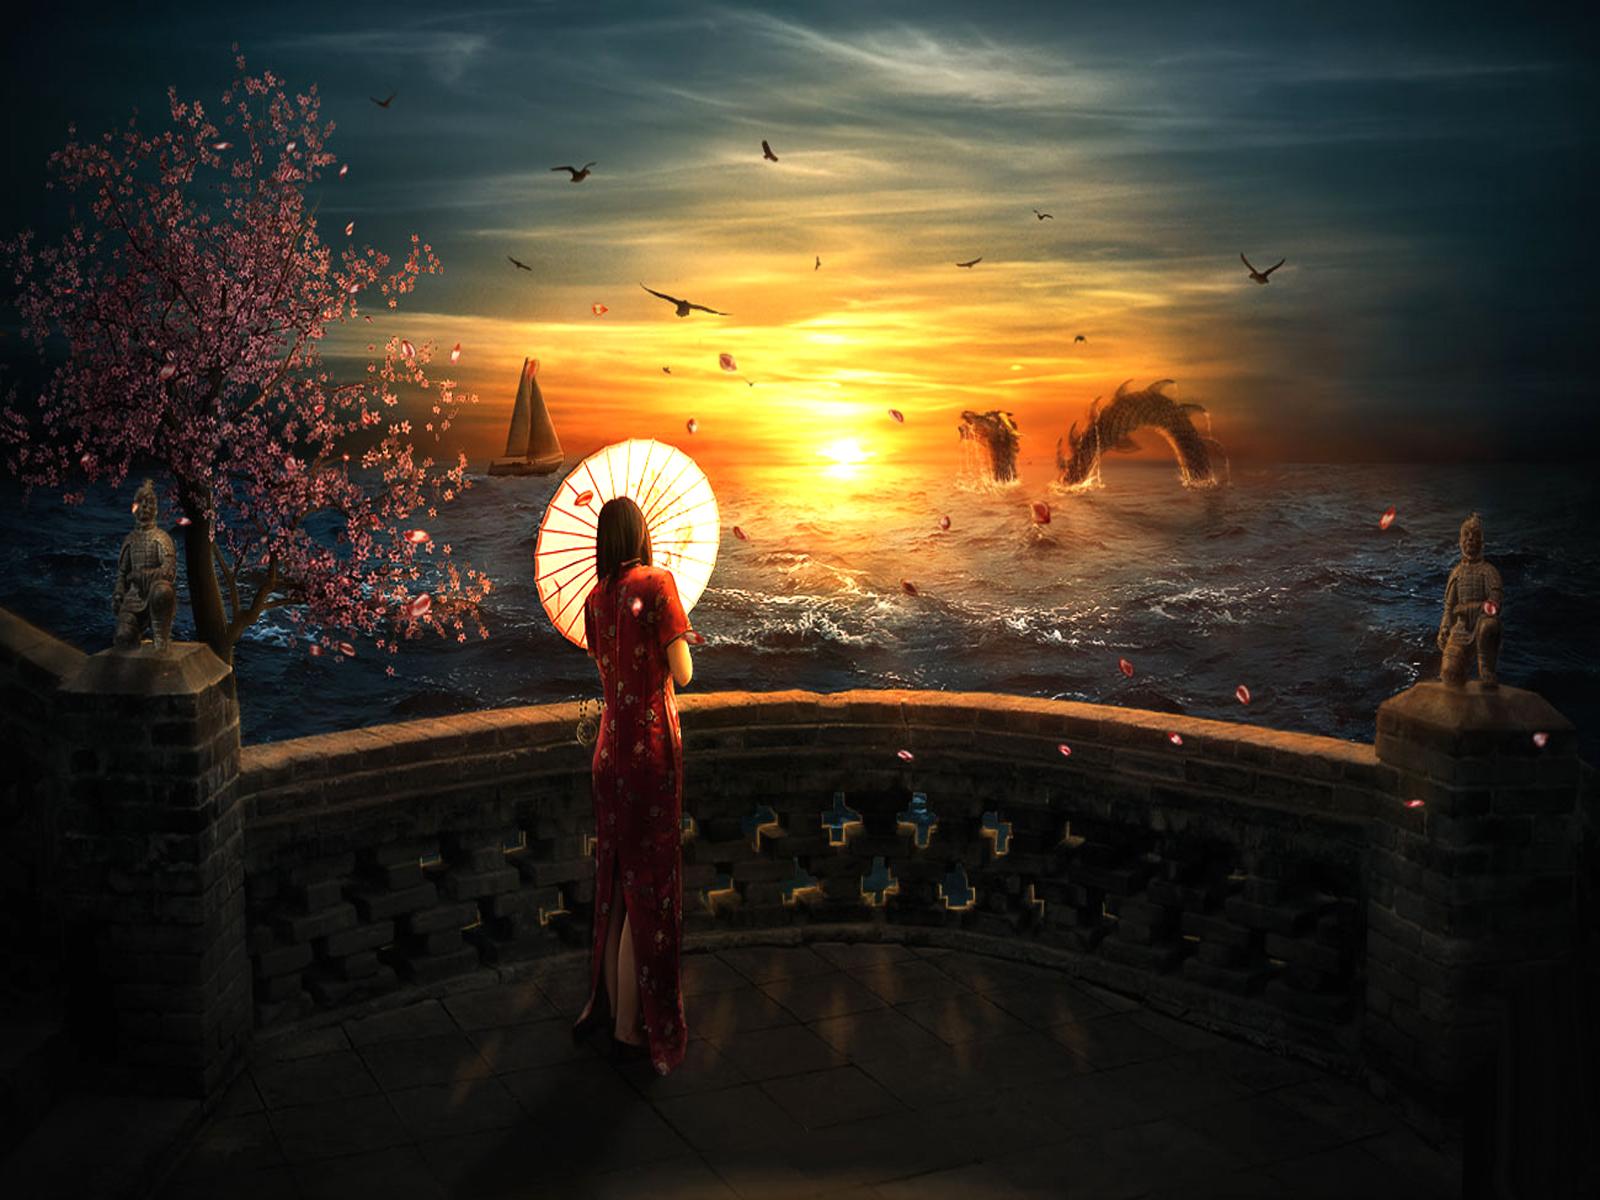 Fantasy - Drachen  Sonnenuntergang Wallpaper